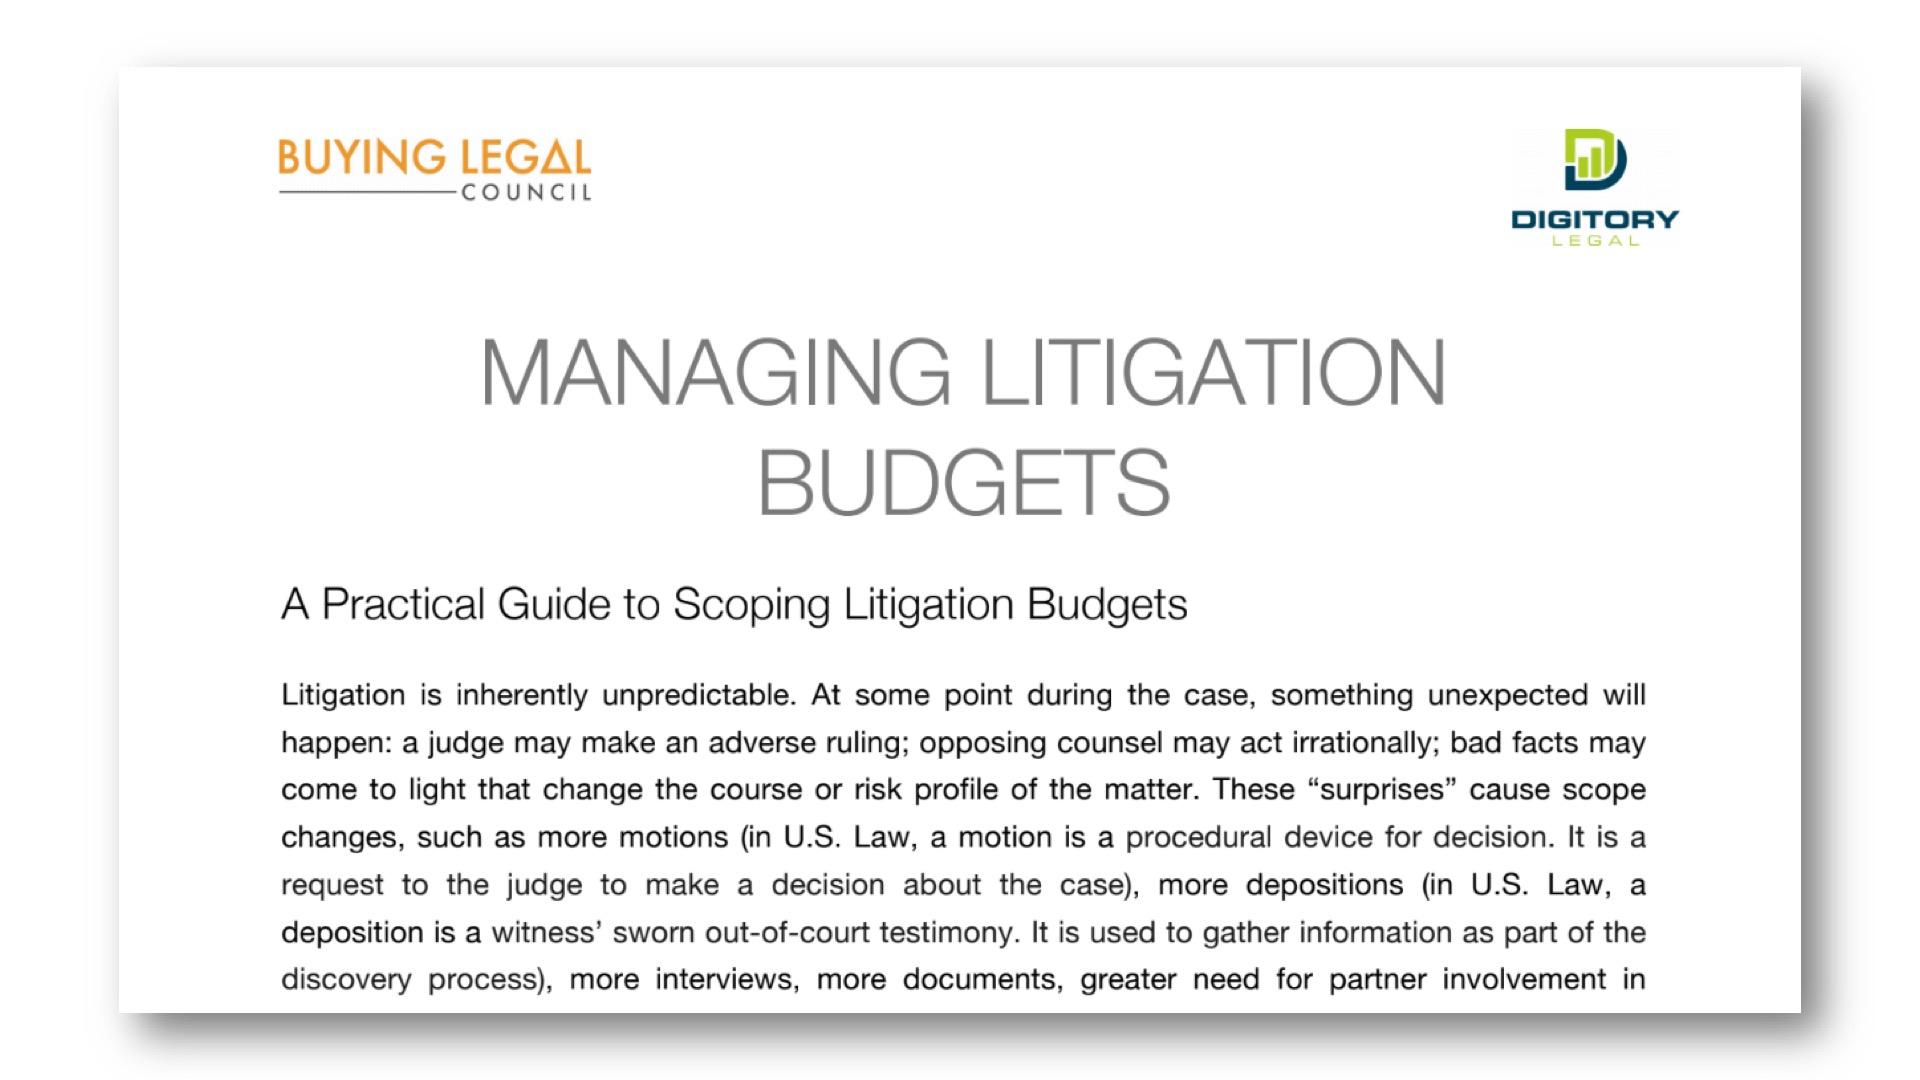 Managing-Litigation-Budgets-Digitory-Legal.jpeg